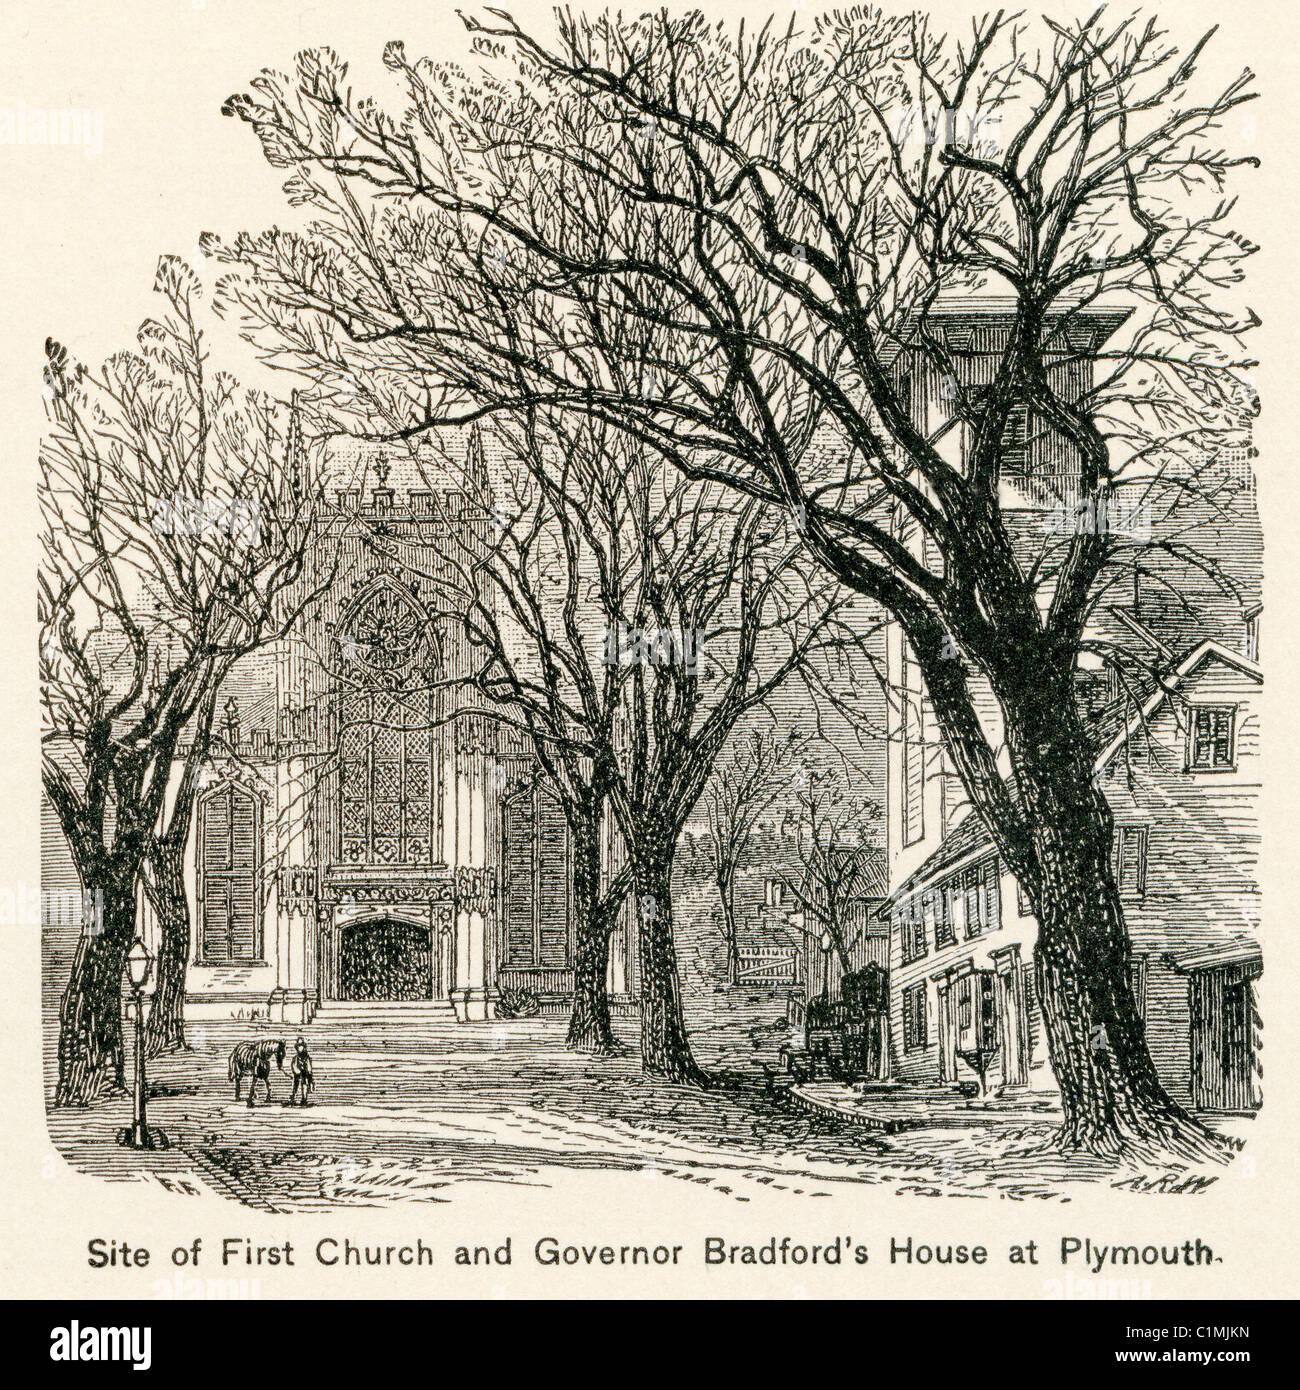 Alte Lithographie von First Church, Plymouth, Massachusetts, USA Stockfoto